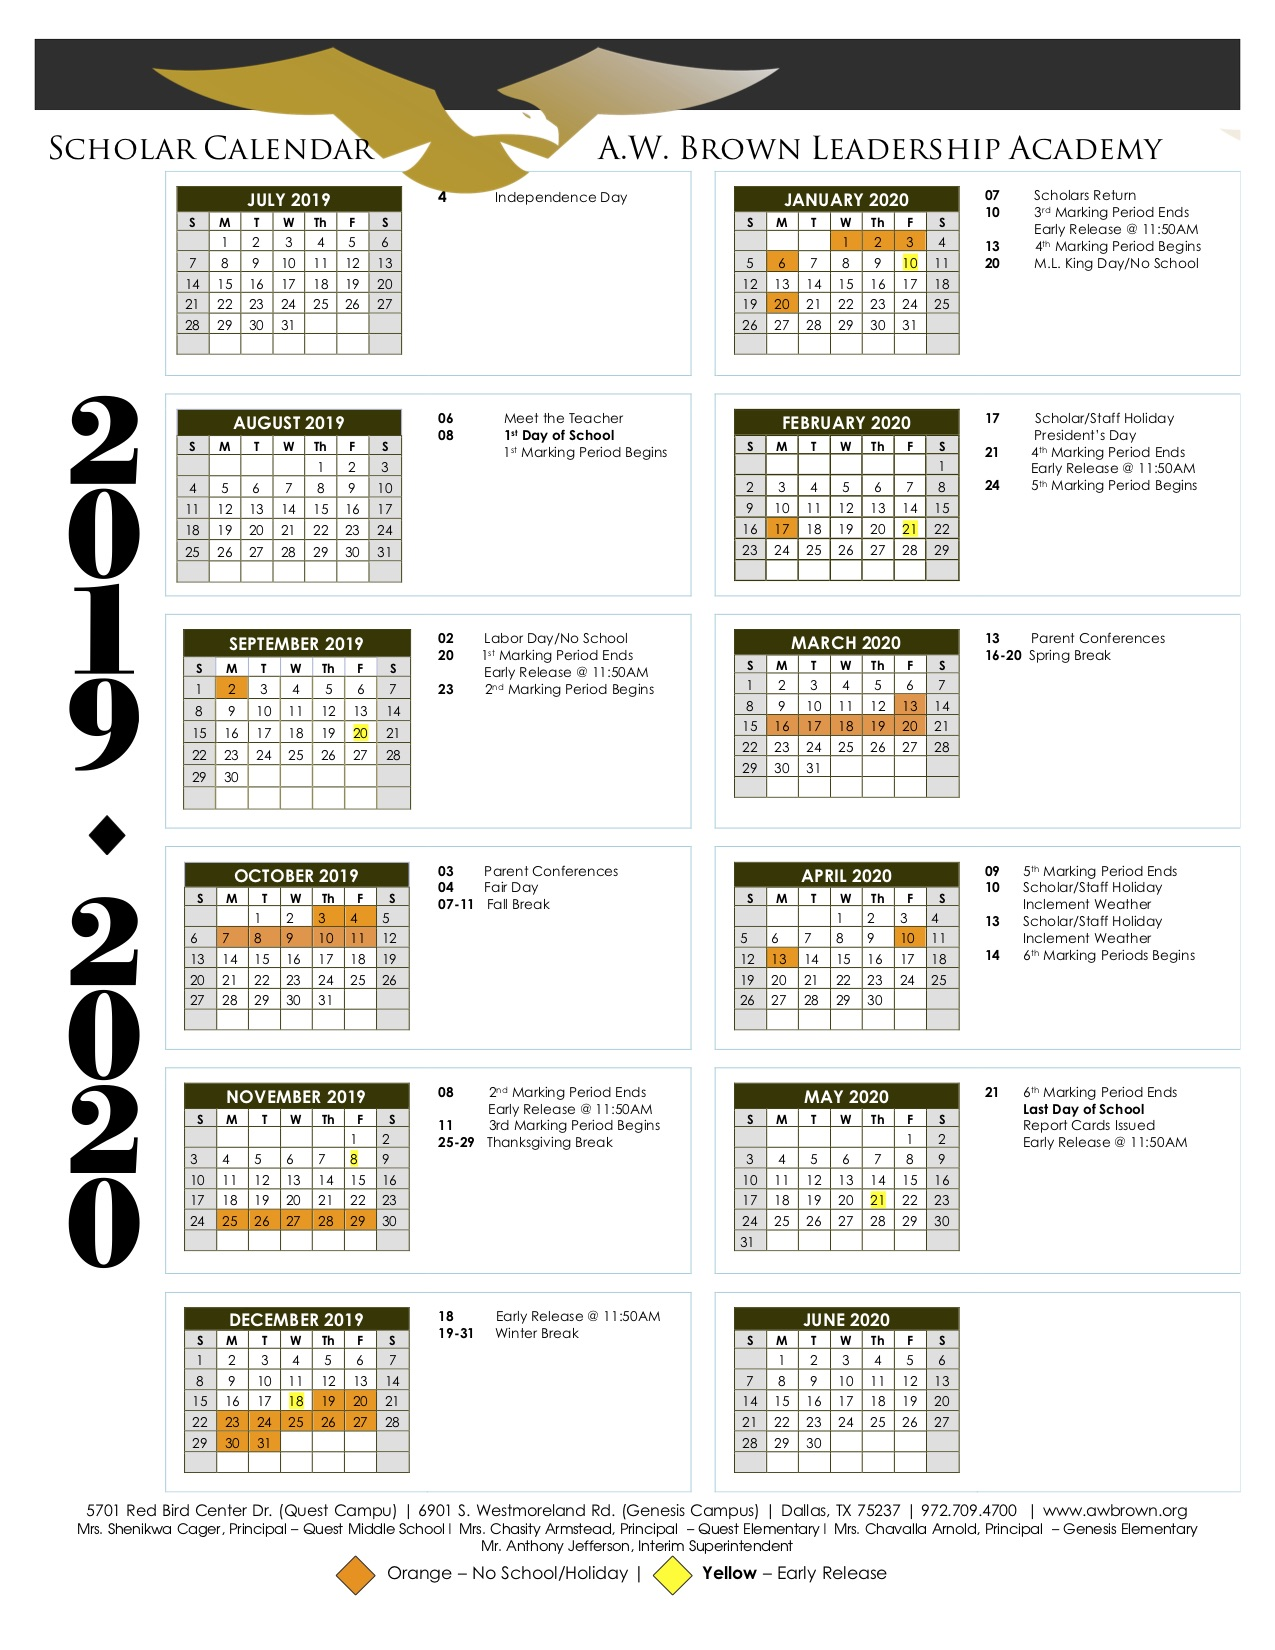 2019-2020 Scholar Calendar